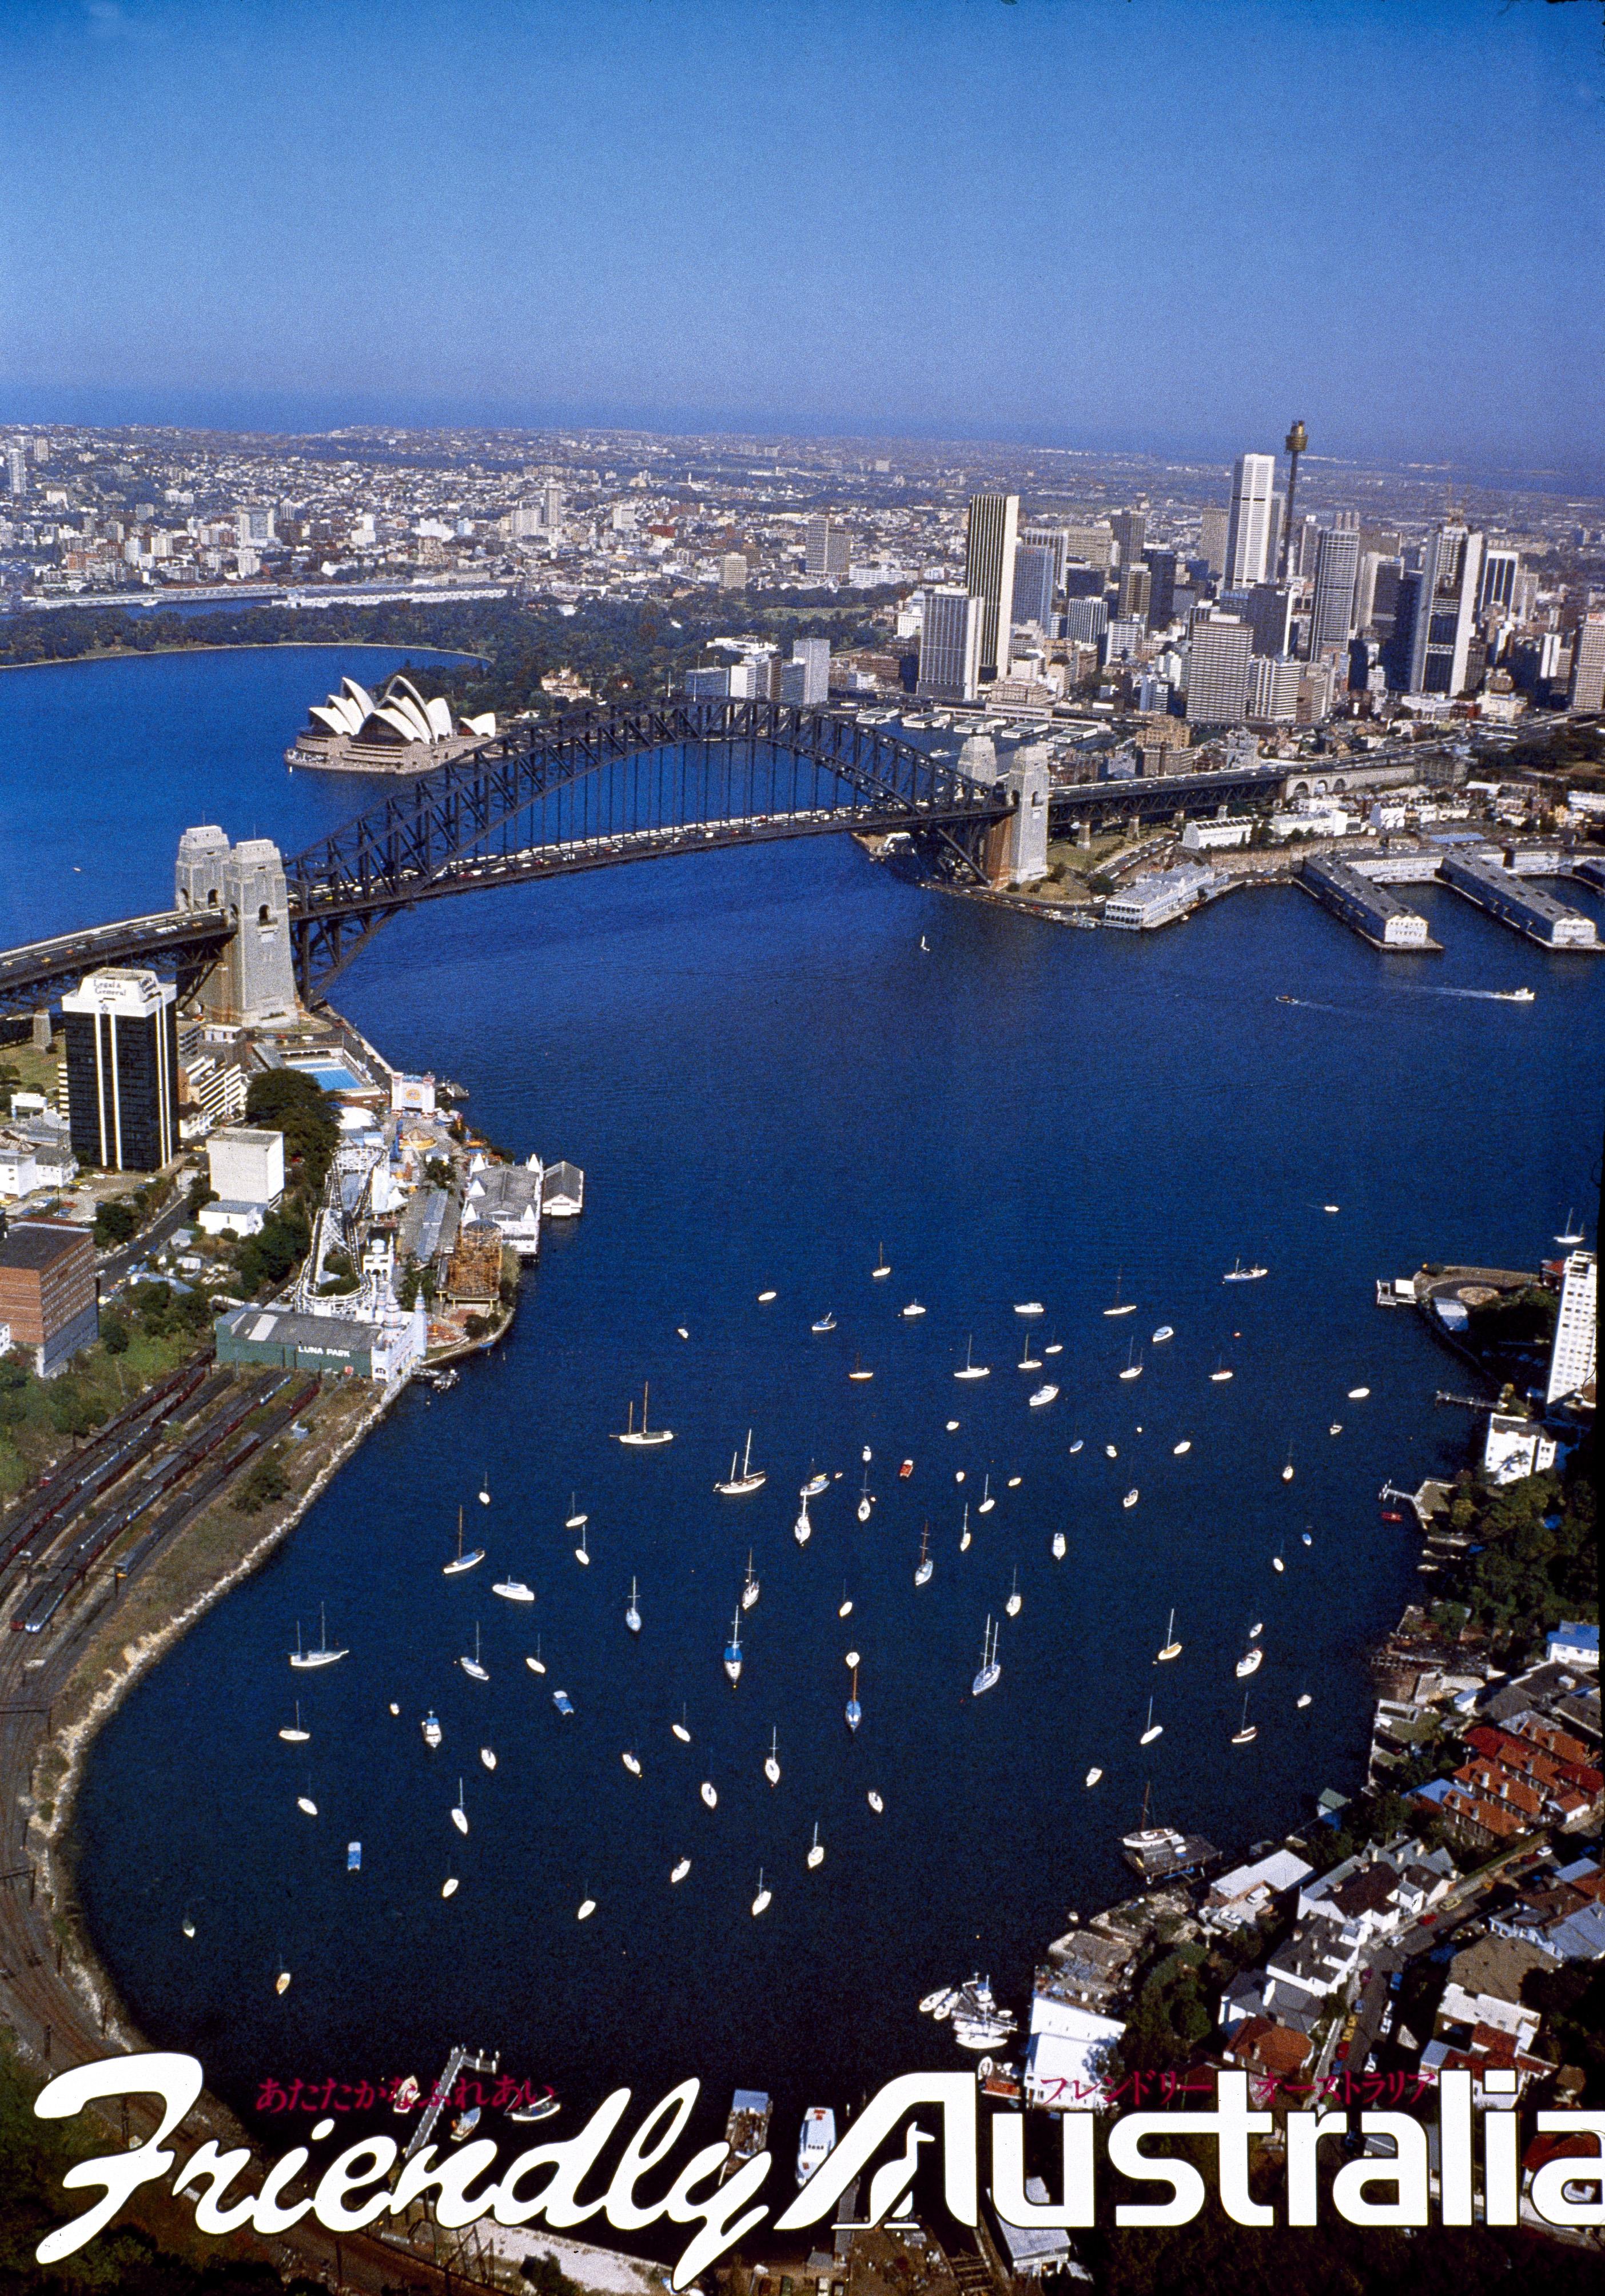 1970s_ Friendly Australia_Sydney Harbour